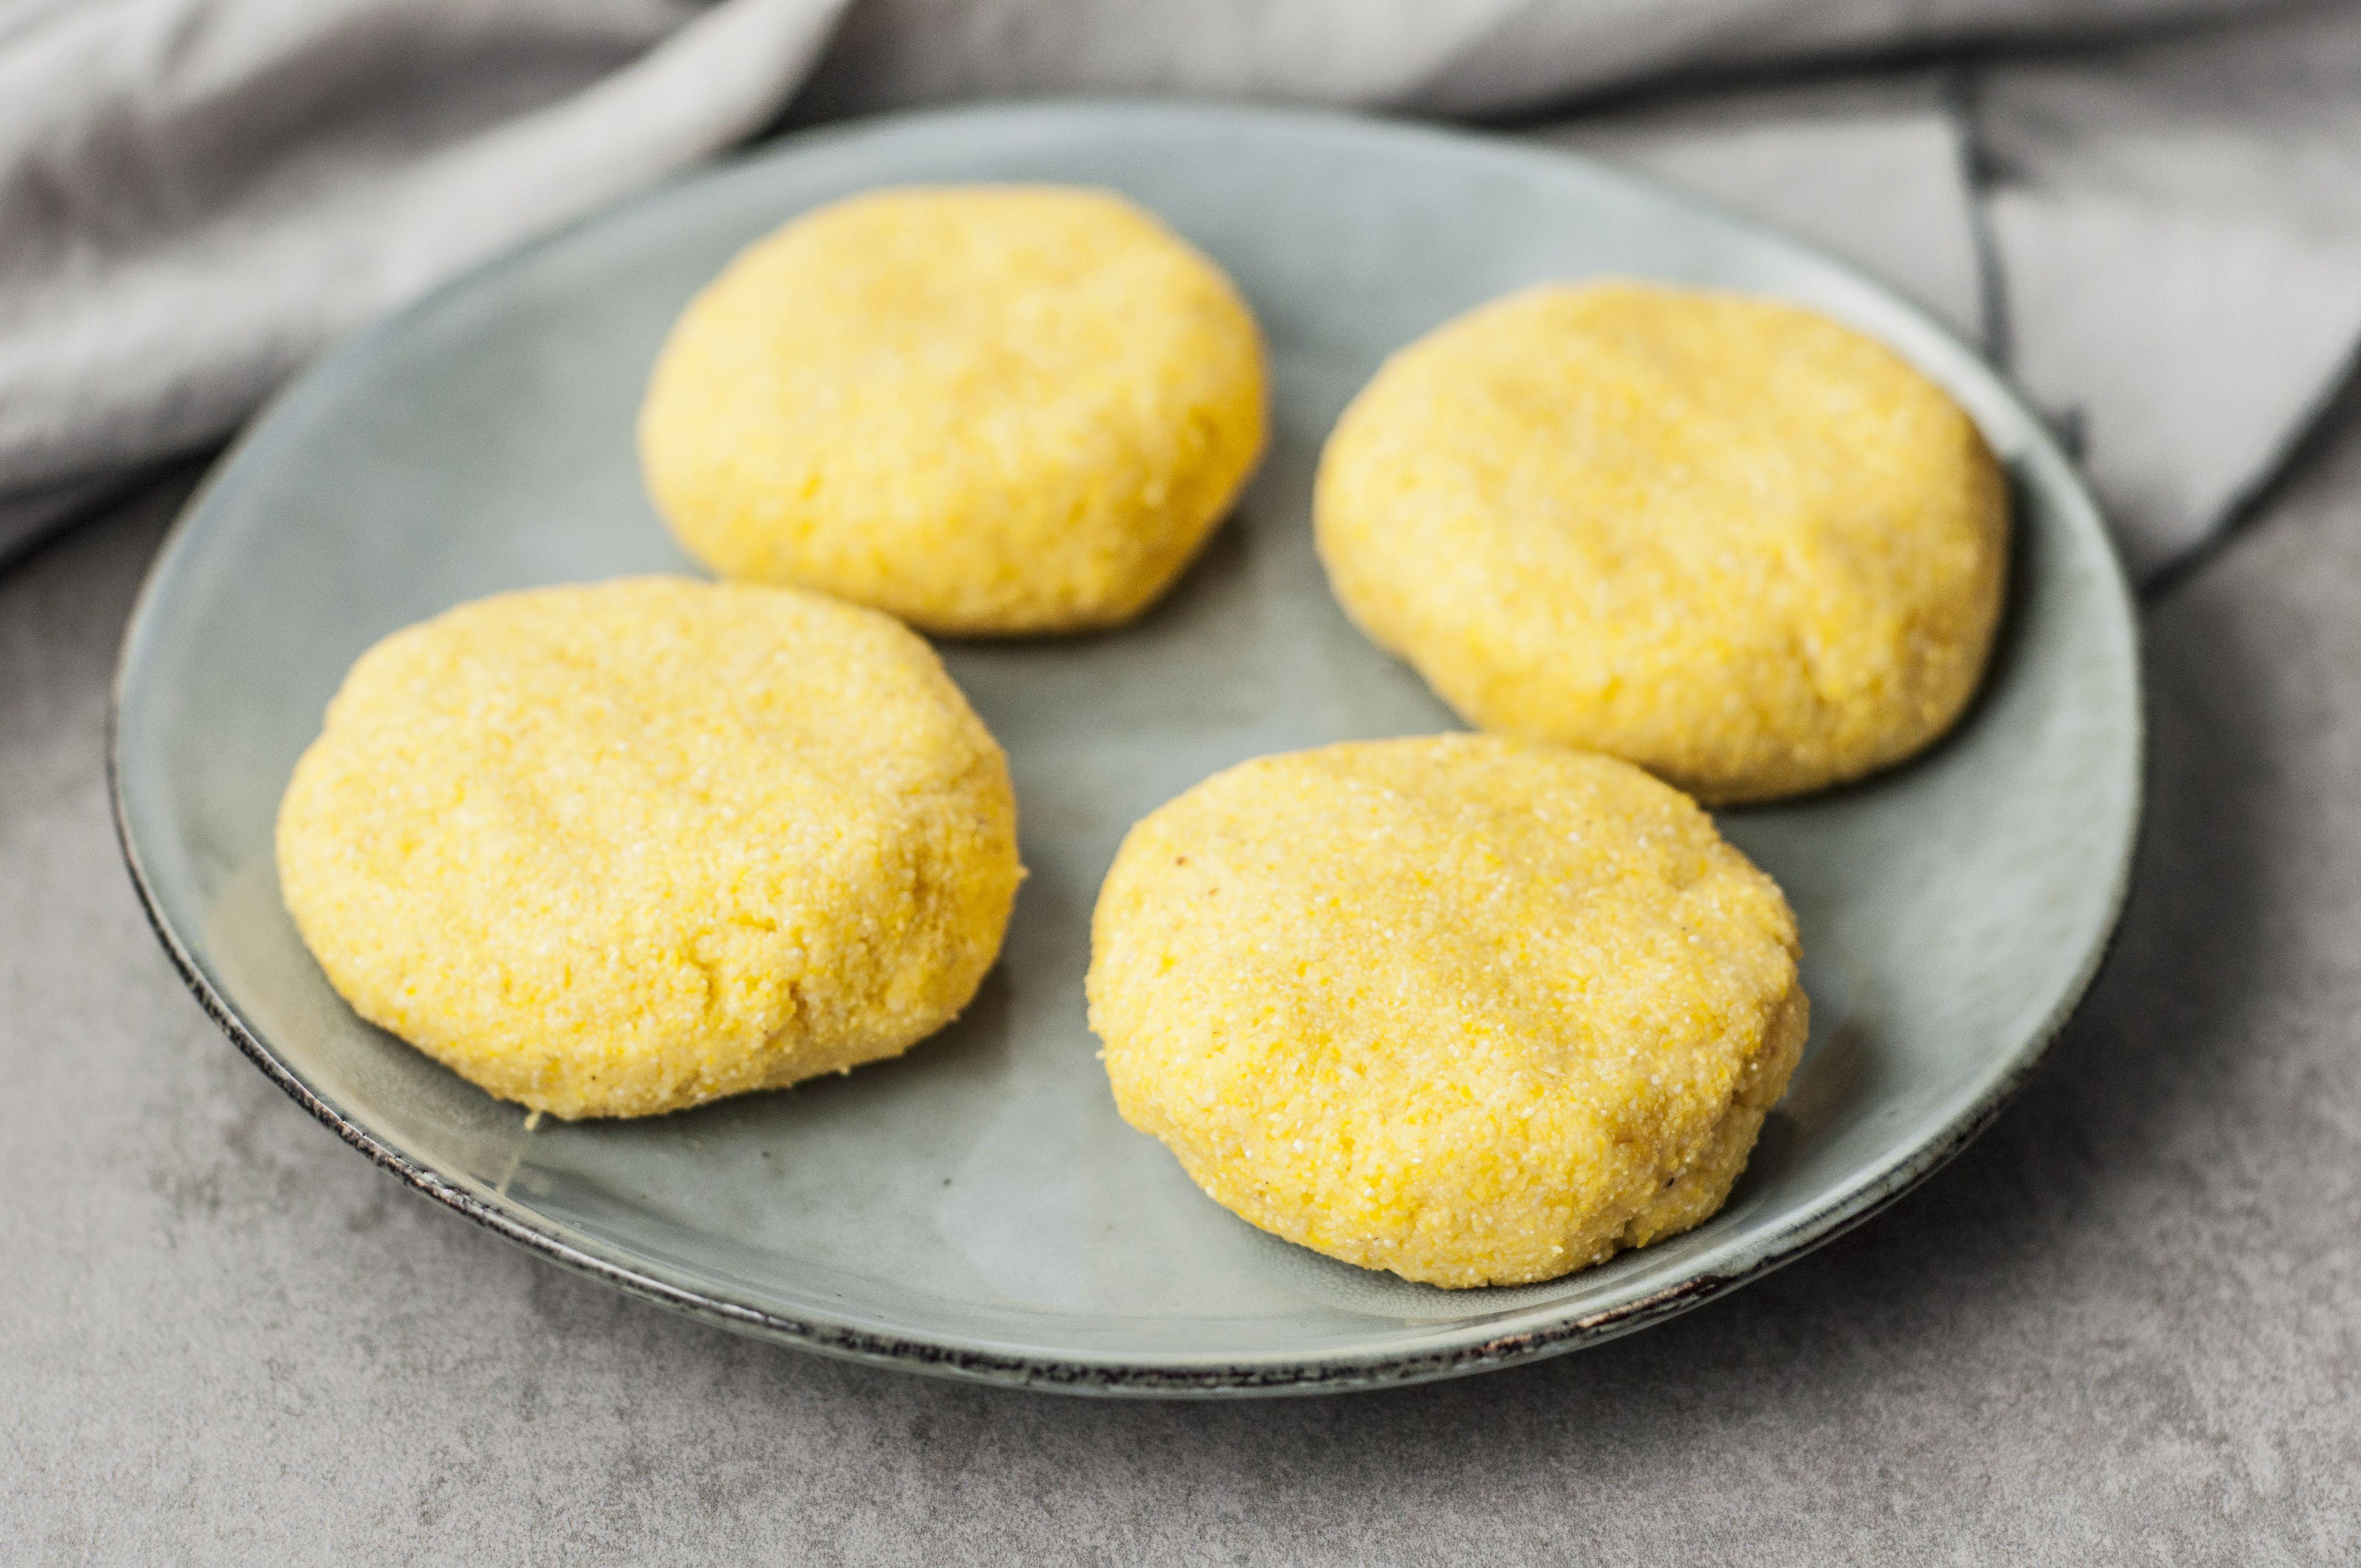 Four cornbread patties, 3/4 inches thick